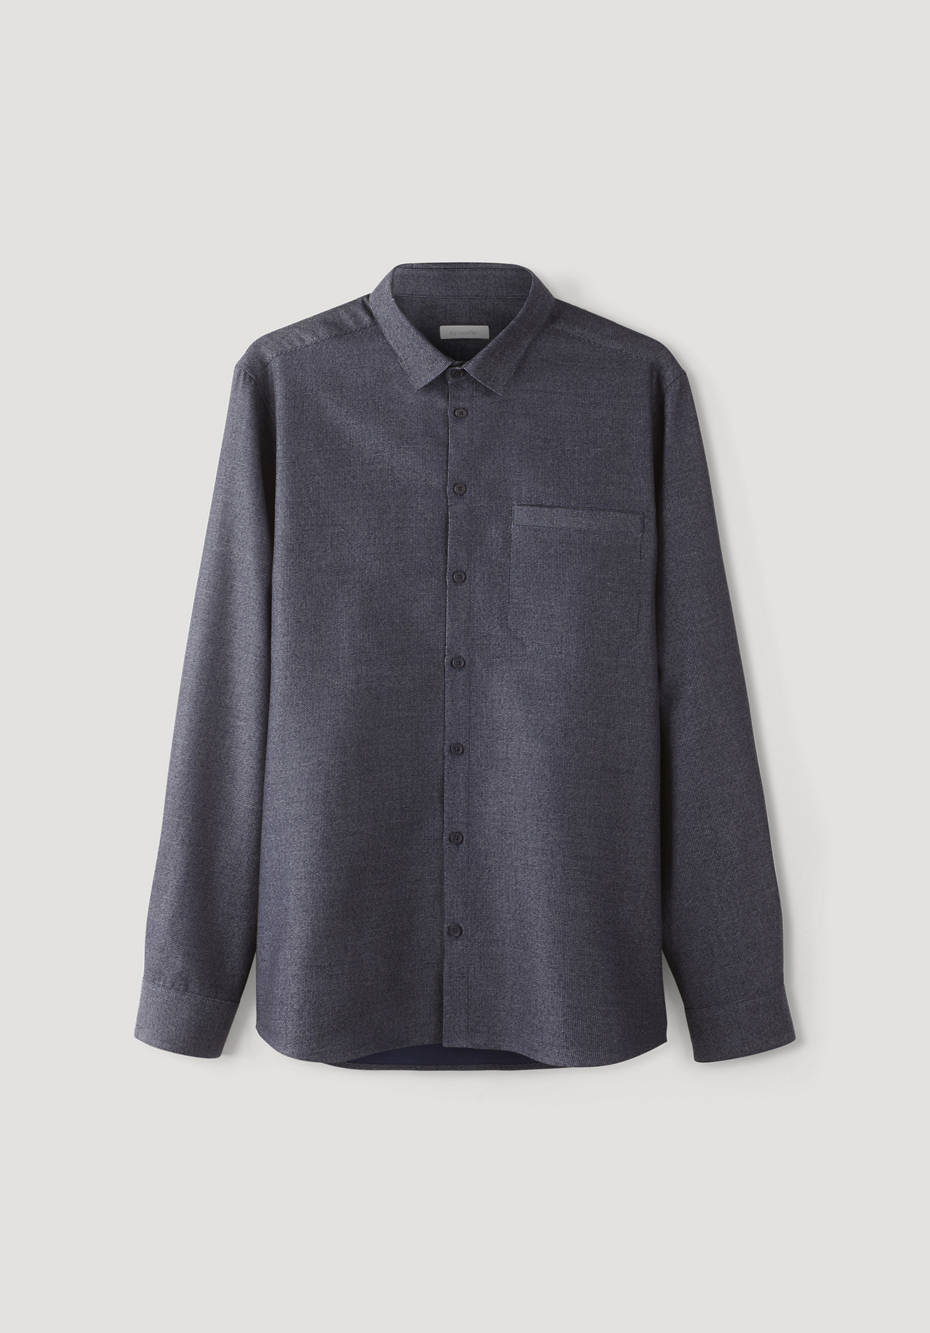 Modern Fit shirt made of pure organic cotton